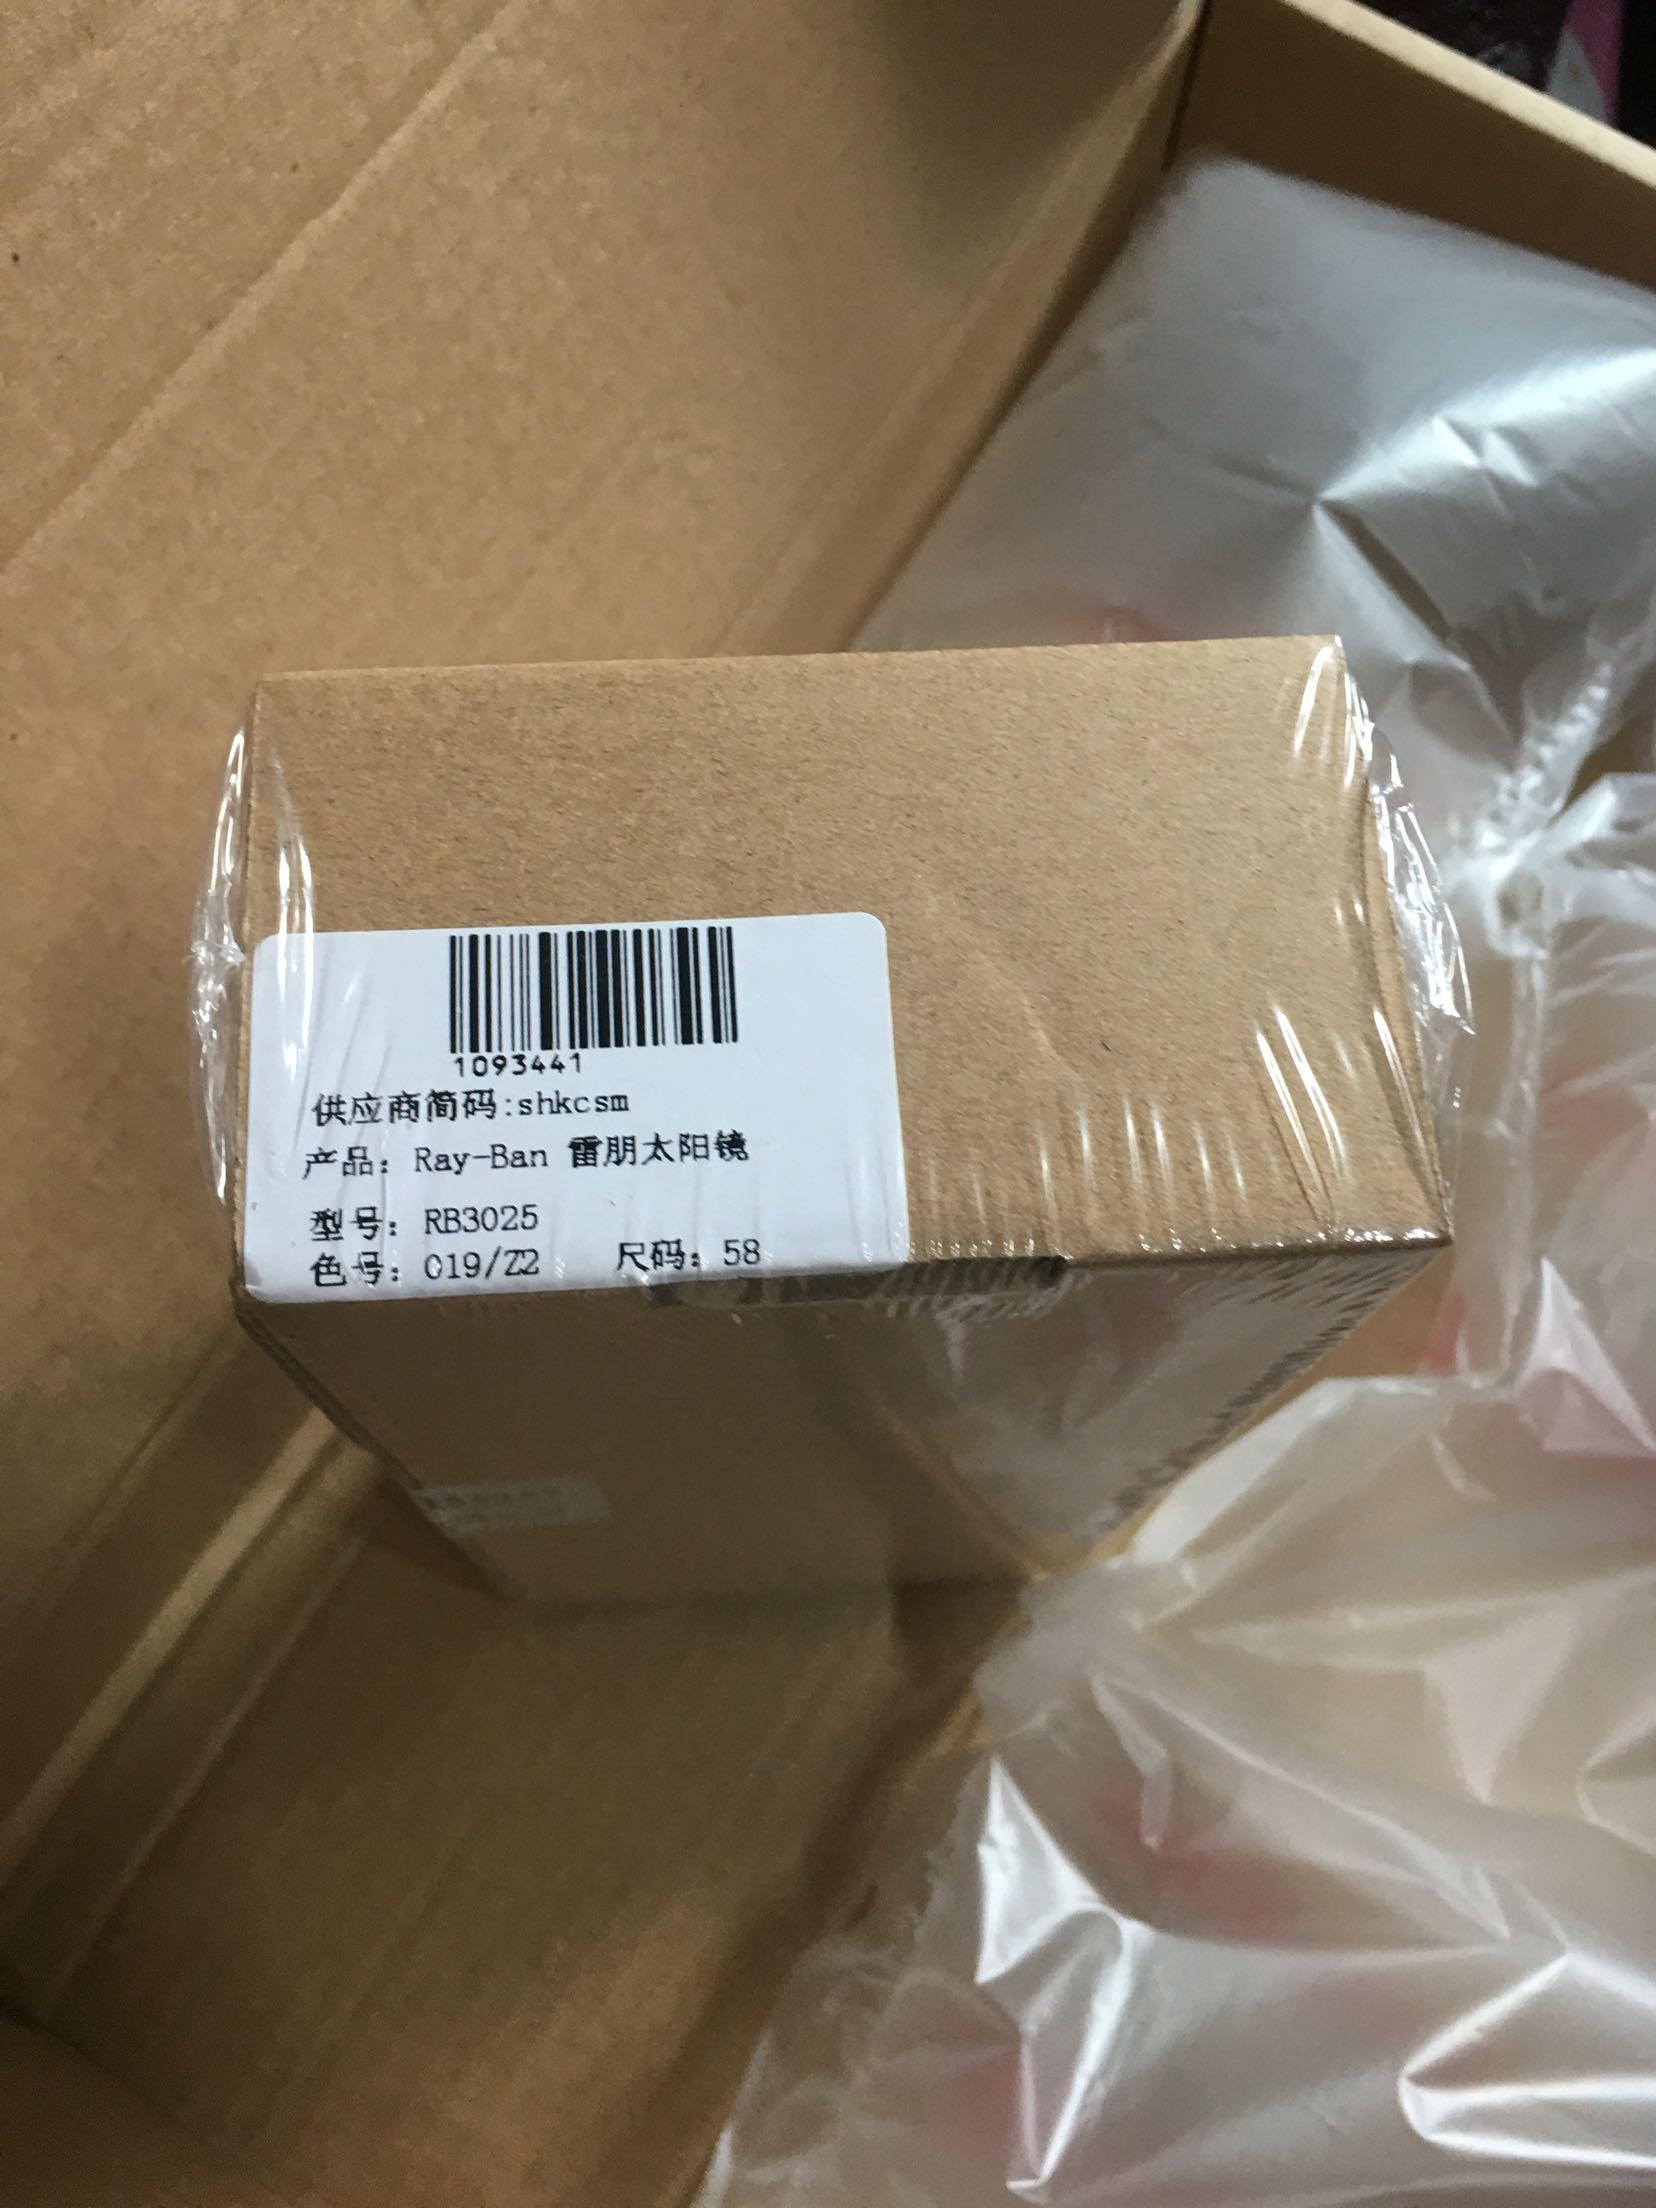 womens handbag 00251075 for-cheap